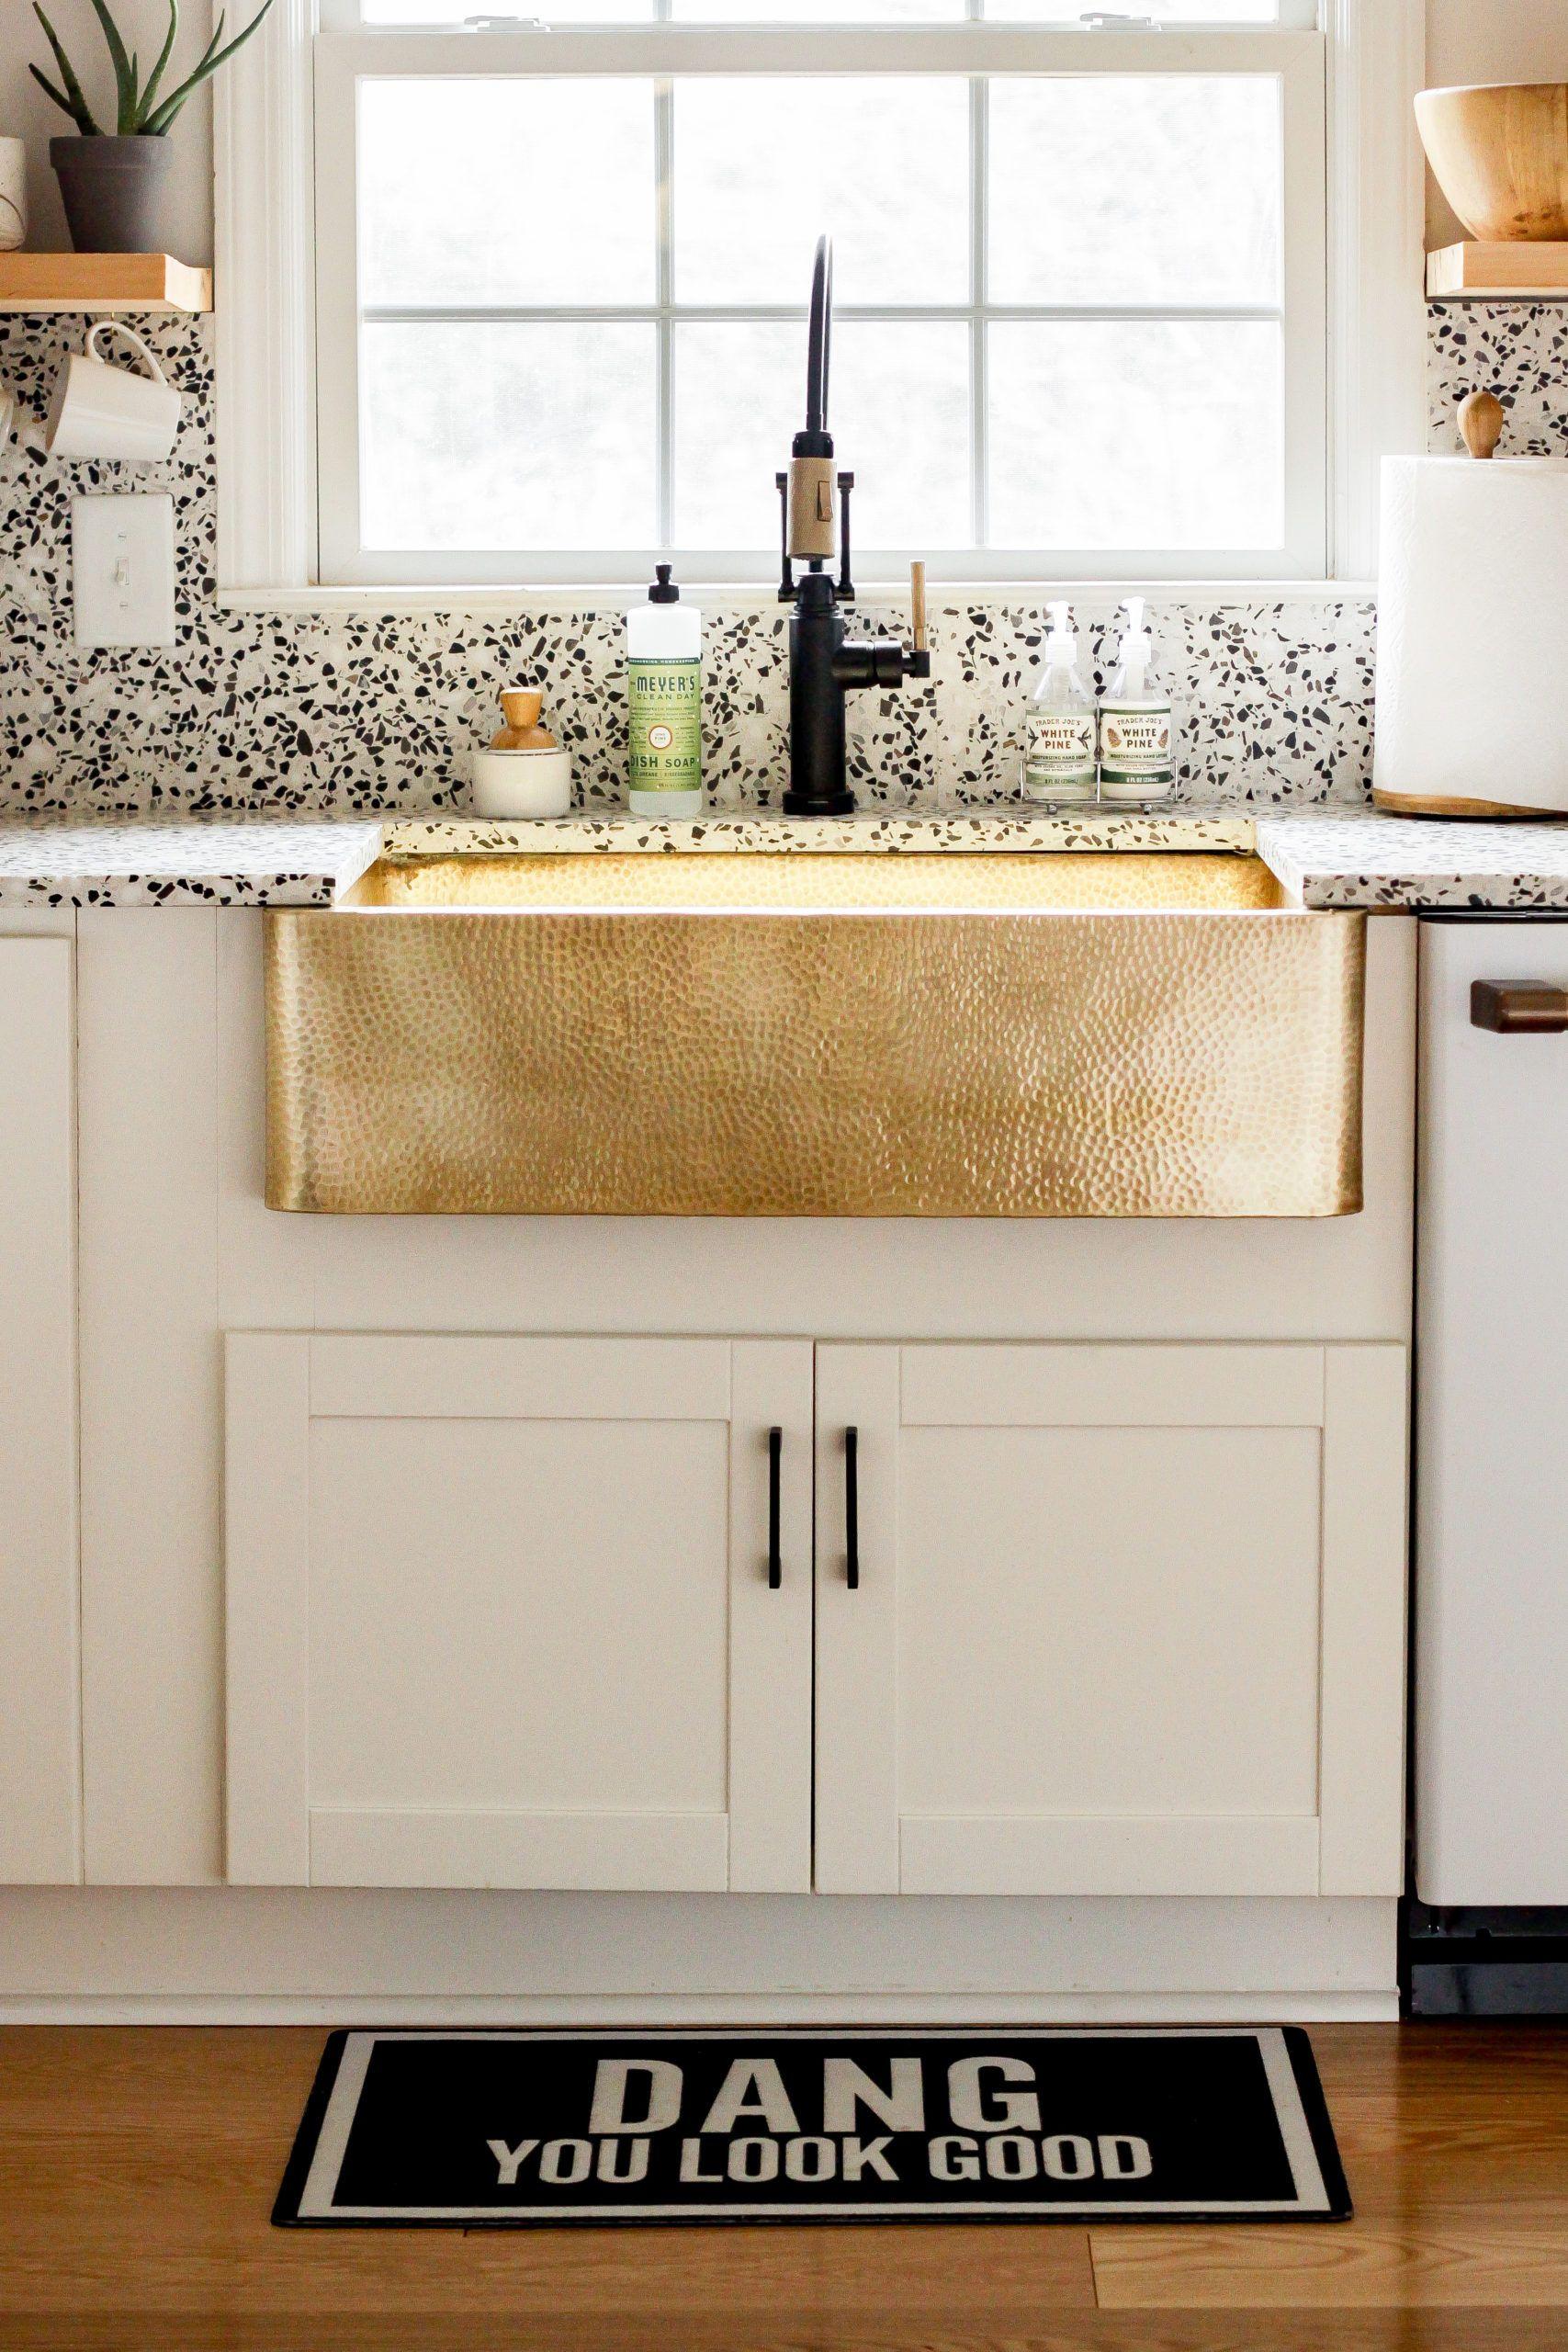 Modern Timeless Organic Kitchen Reveal It S Finally Here Brass Sink White Modern Kitchen Organic Modern Decor